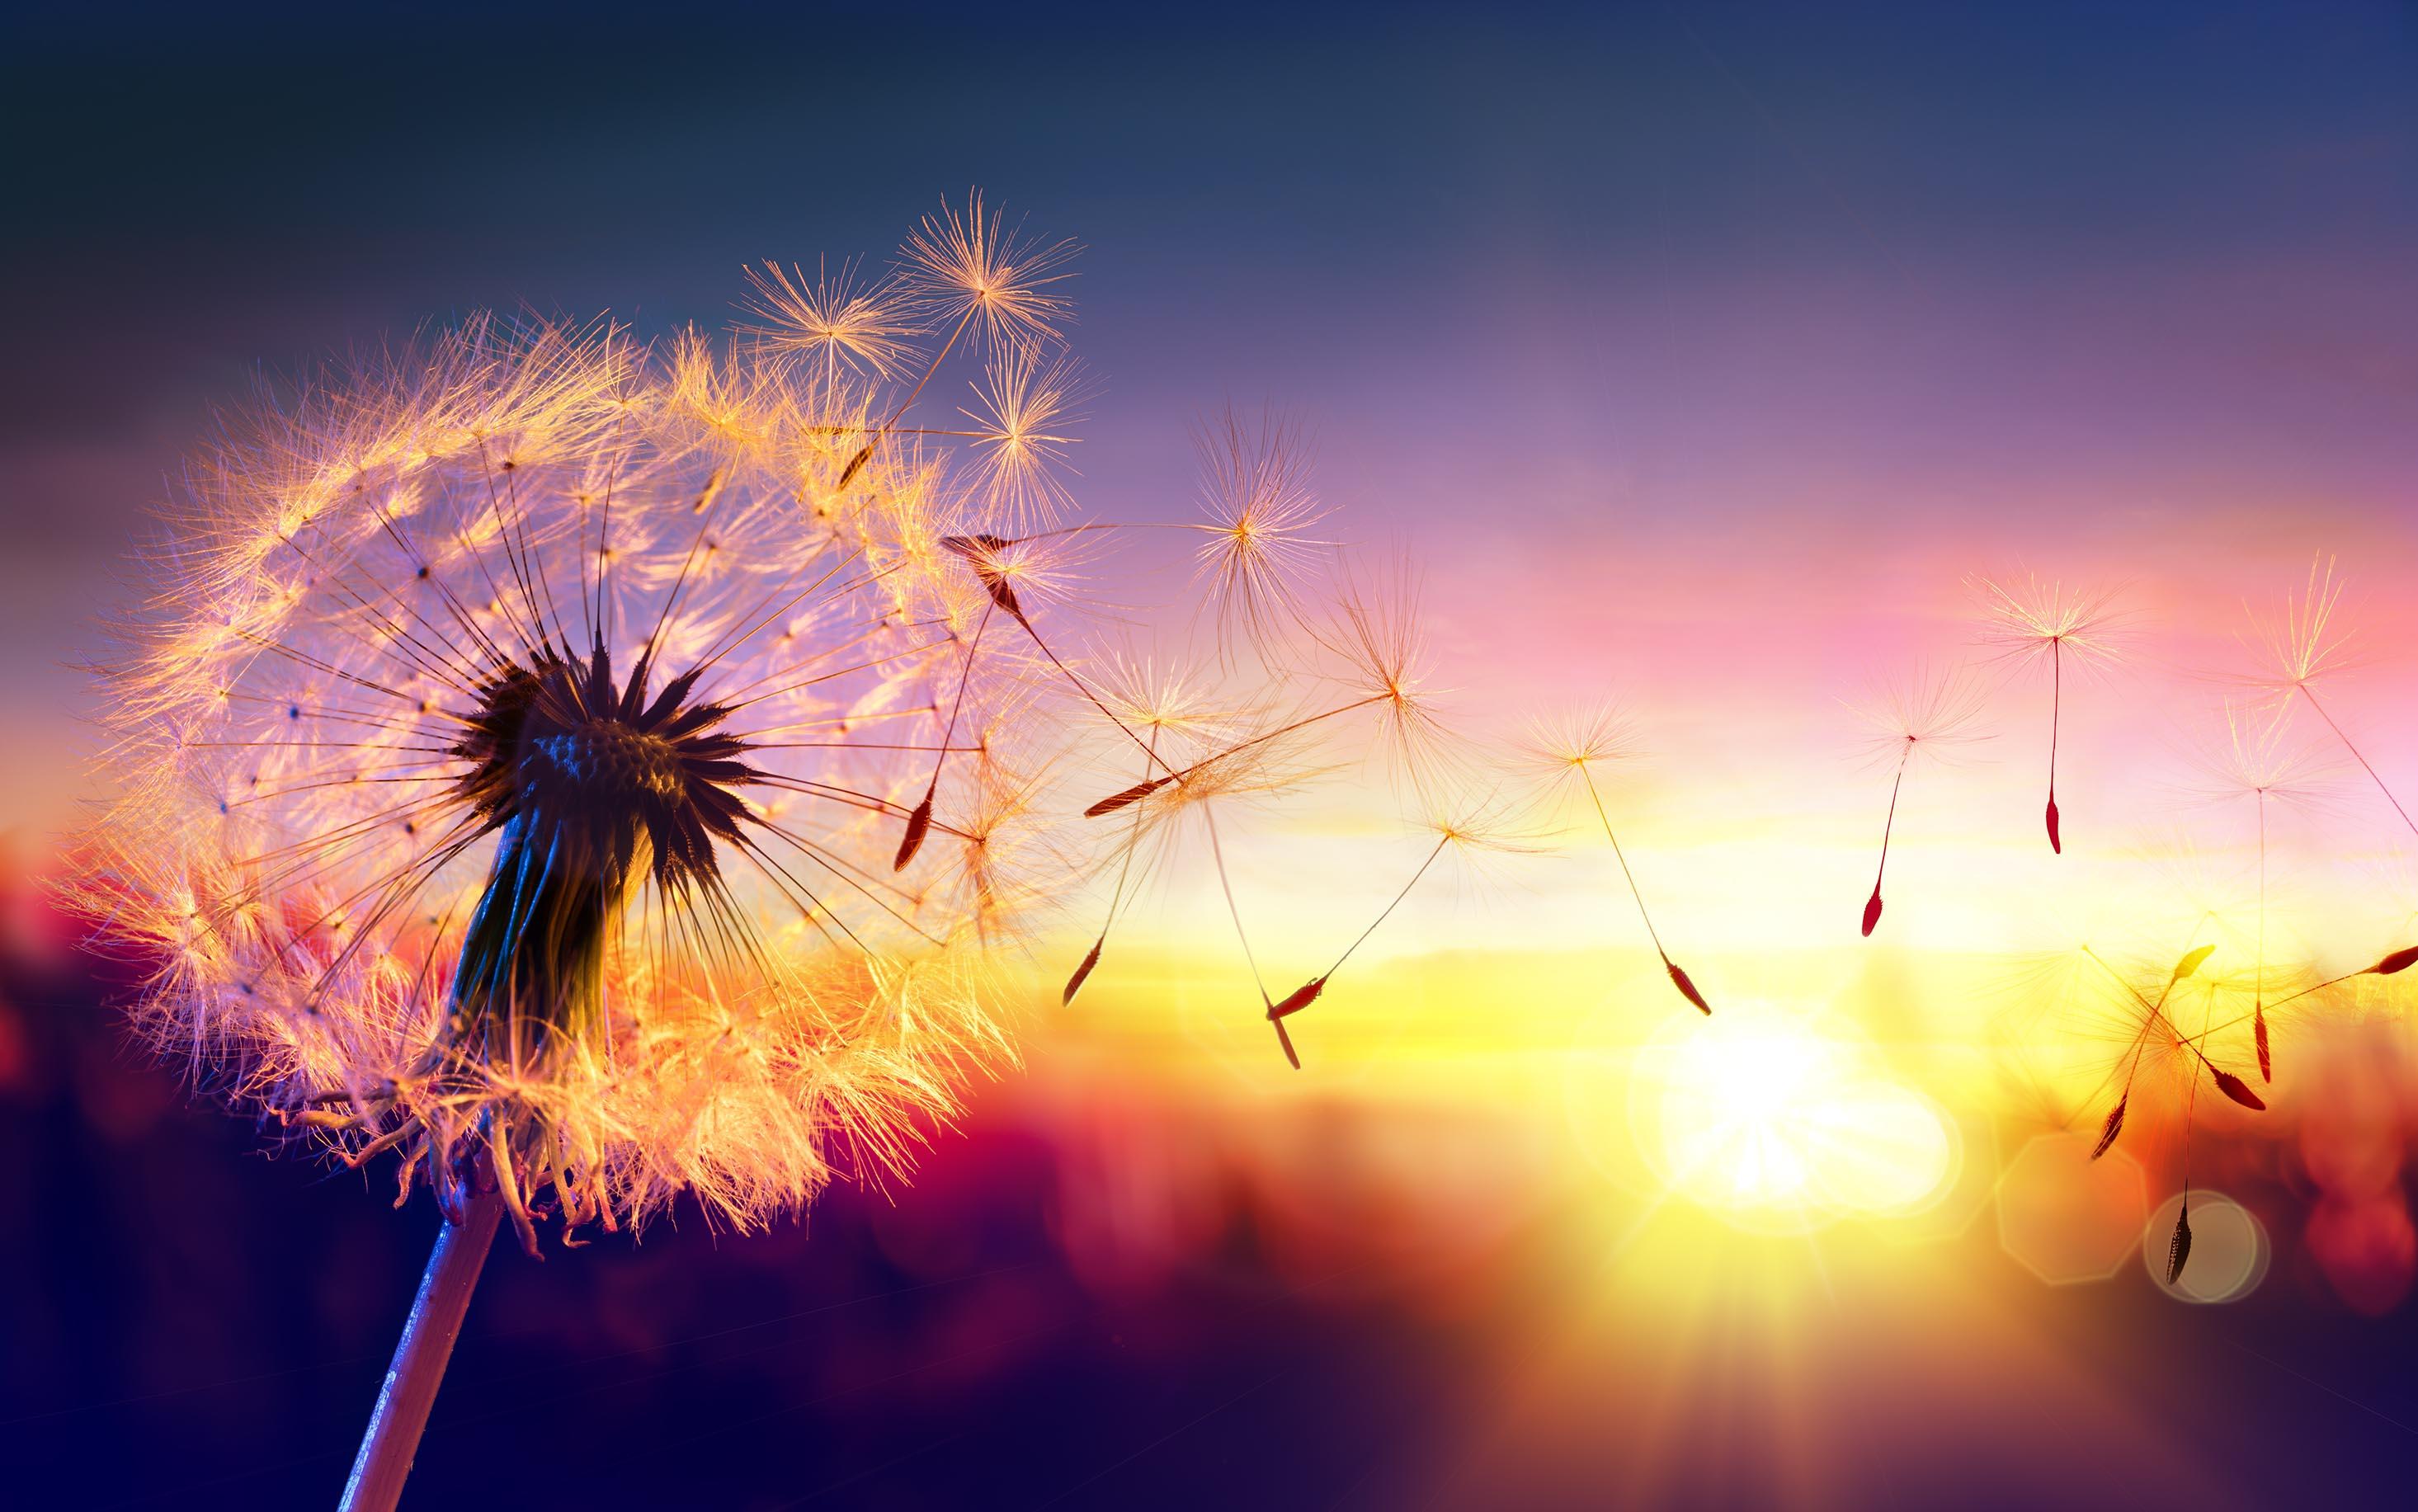 Canvas Print - Dandelion In Sunset